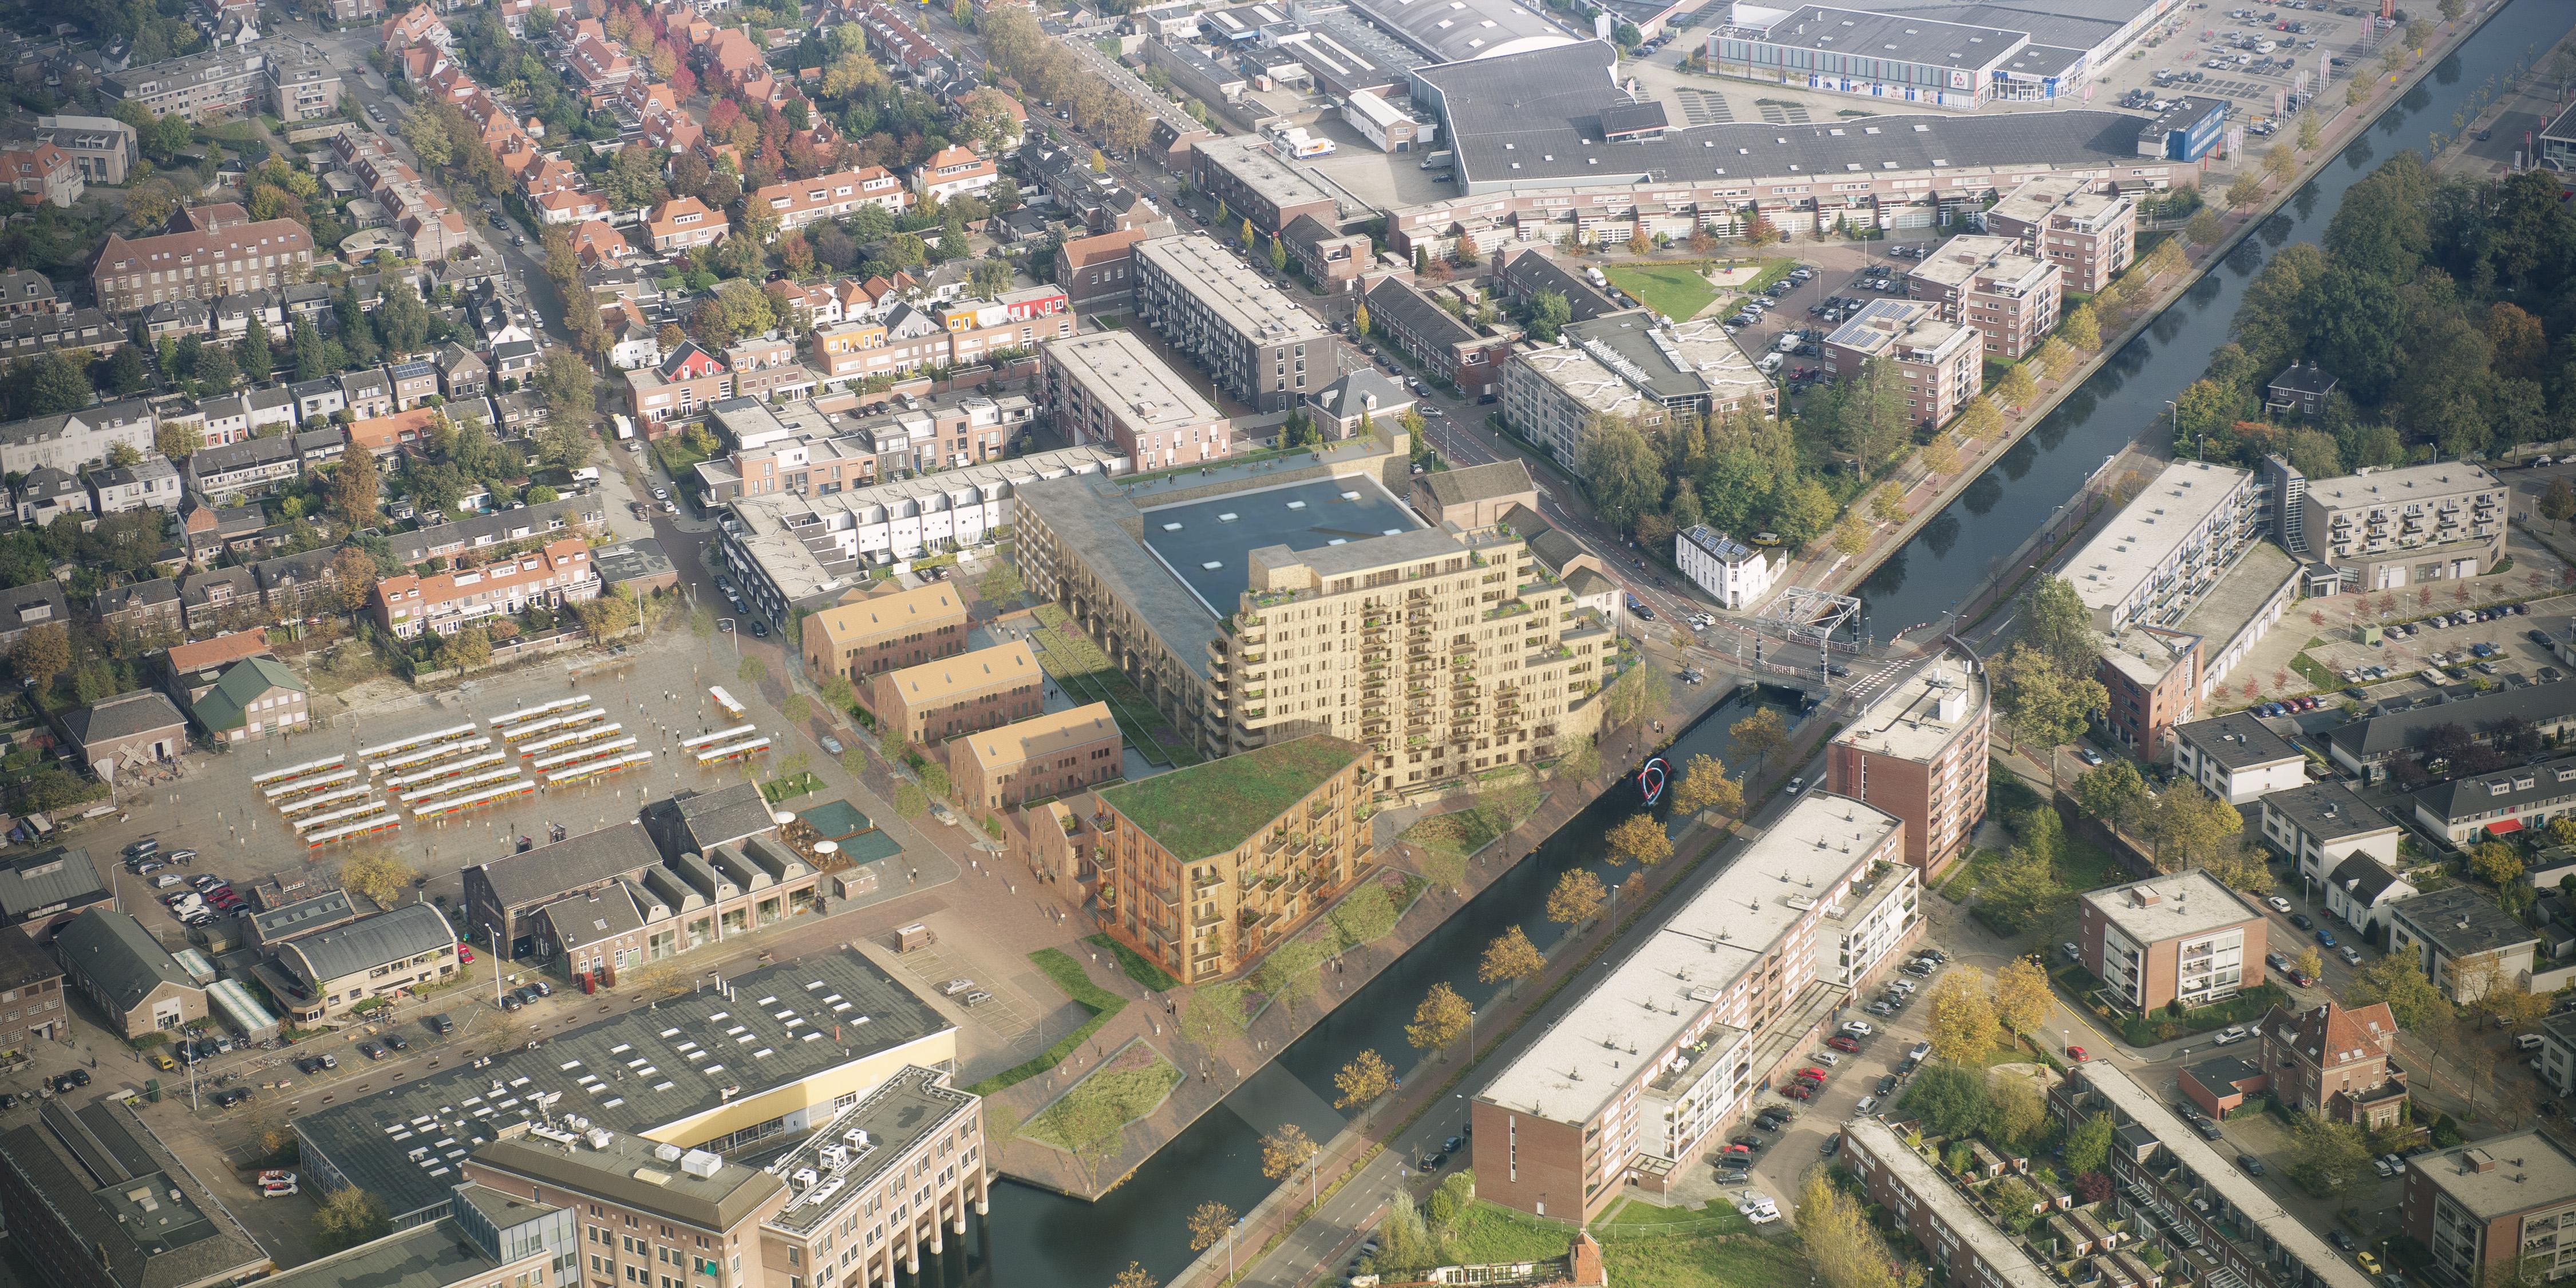 Picuskade Eindhoven